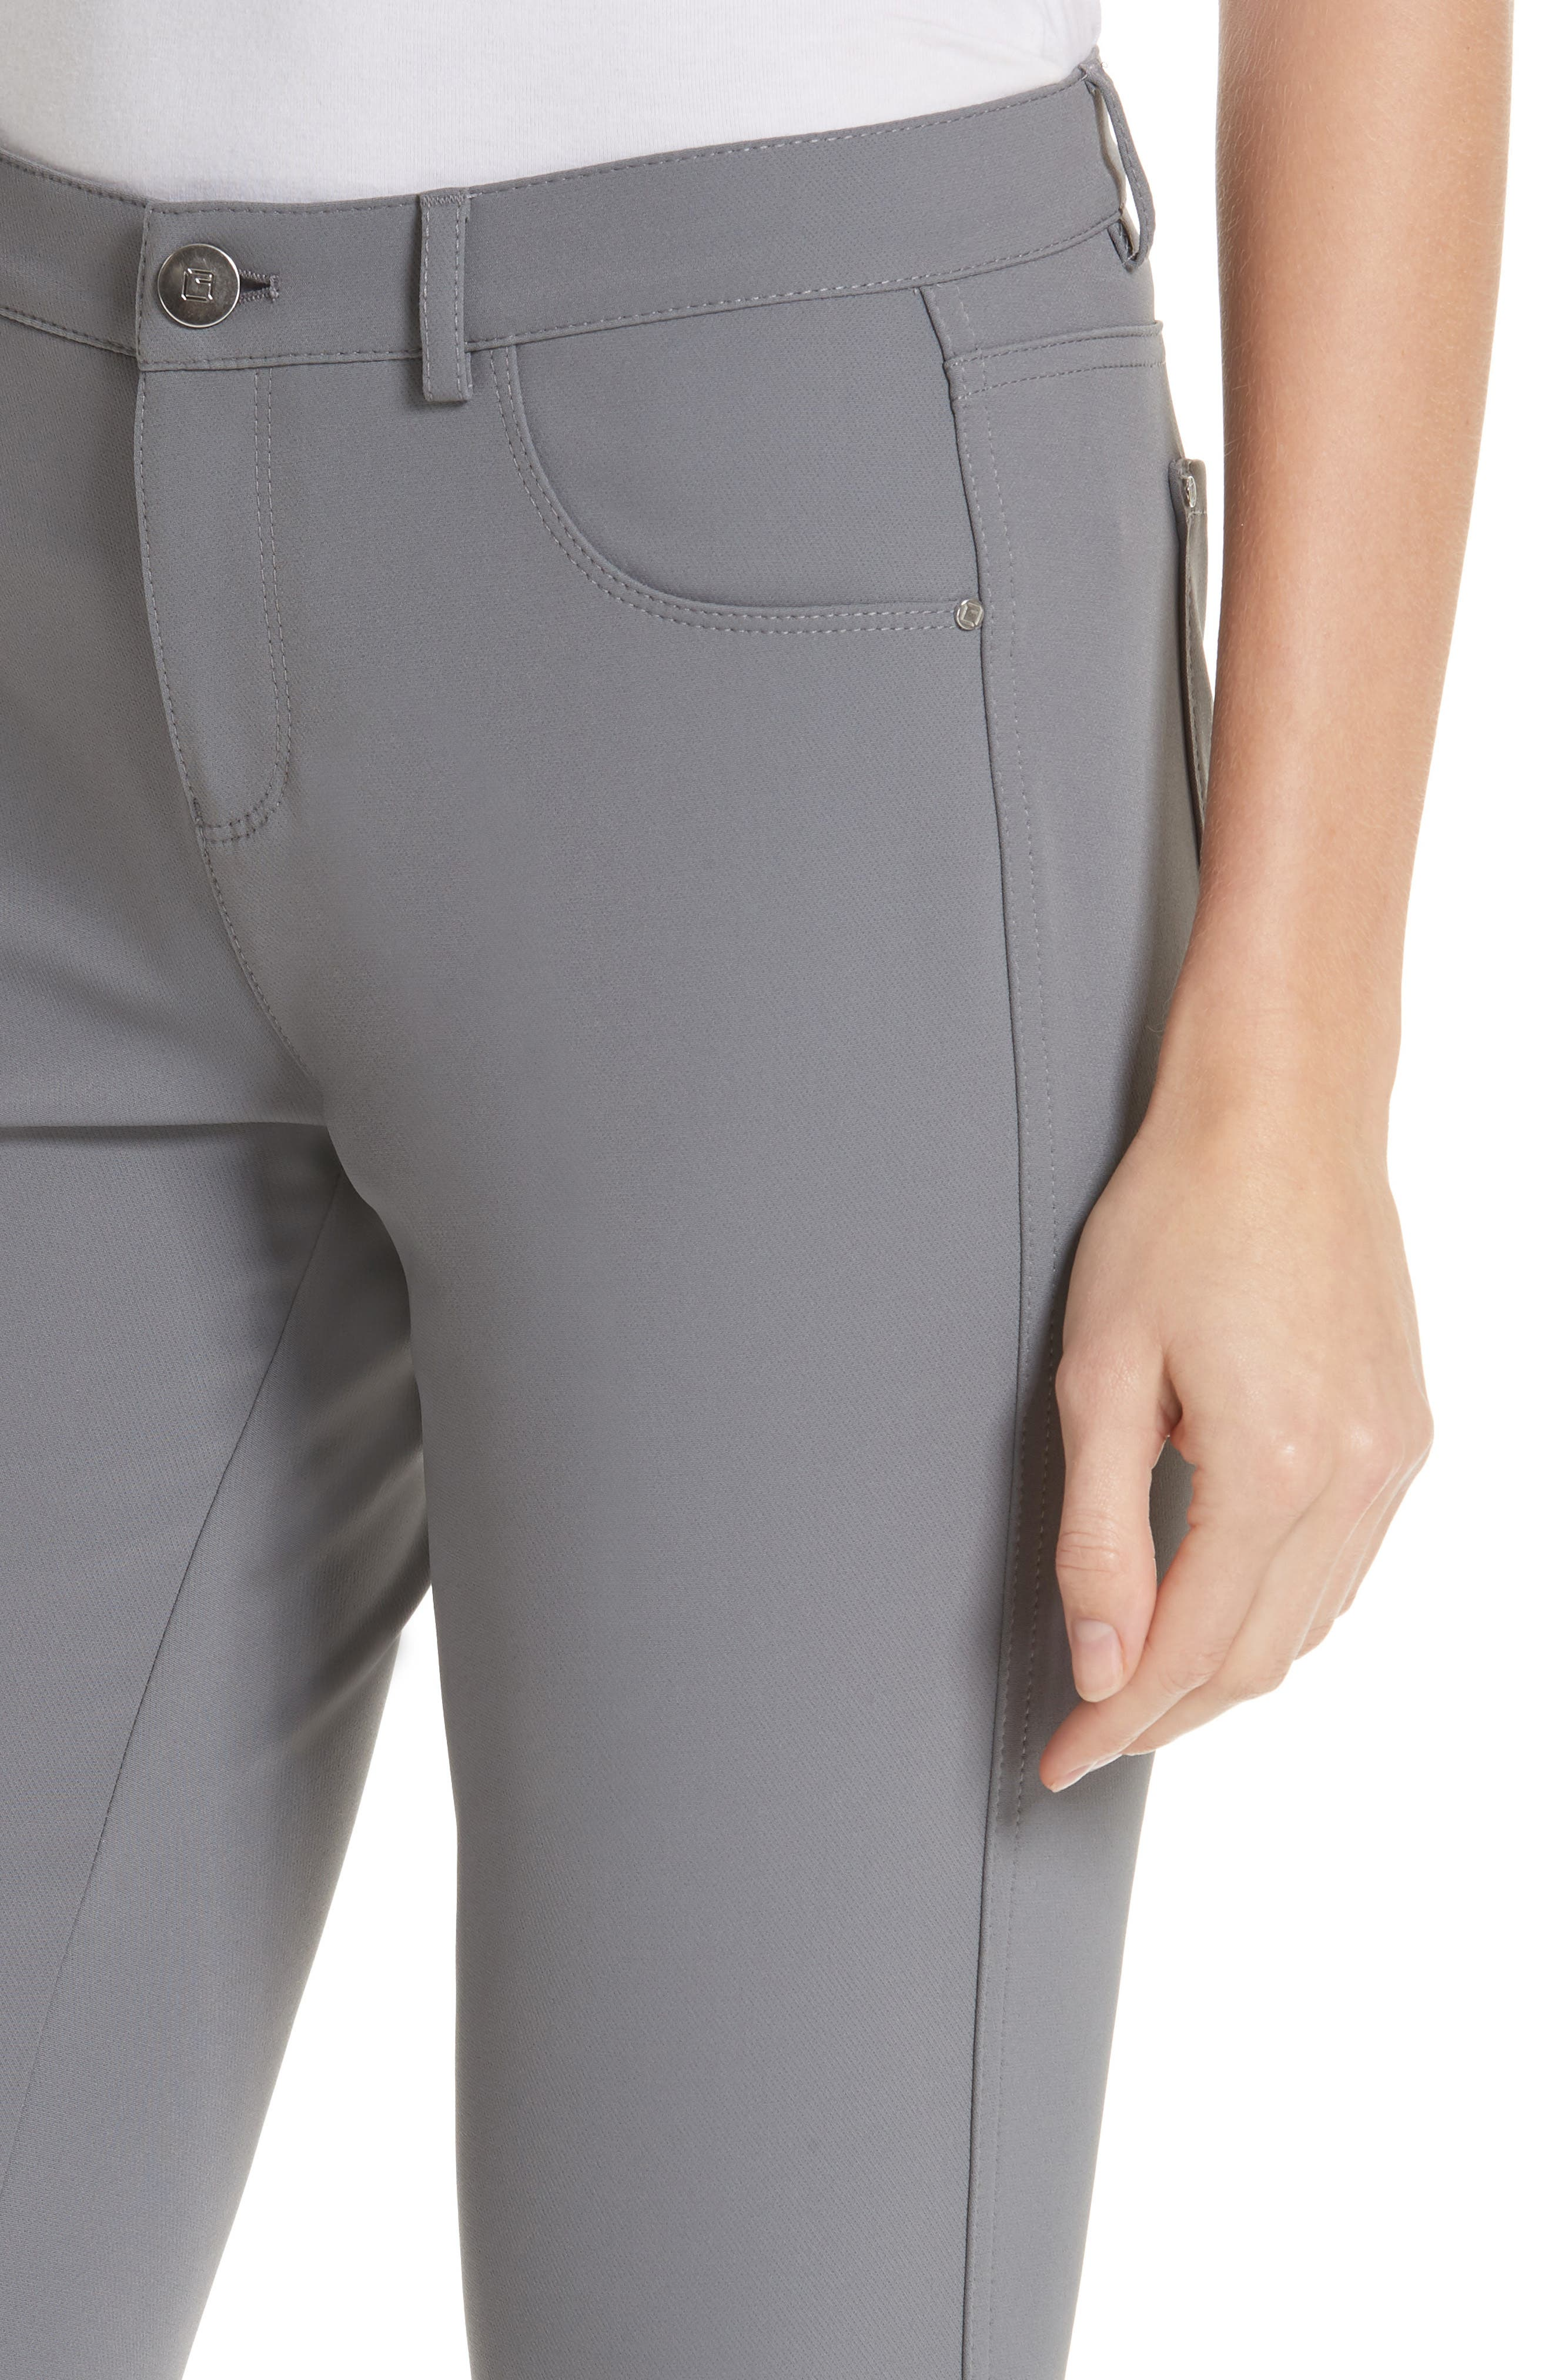 LAFAYETTE 148 NEW YORK,                             Mercer Acclaimed Stretch Skinny Pants,                             Alternate thumbnail 4, color,                             CINDER